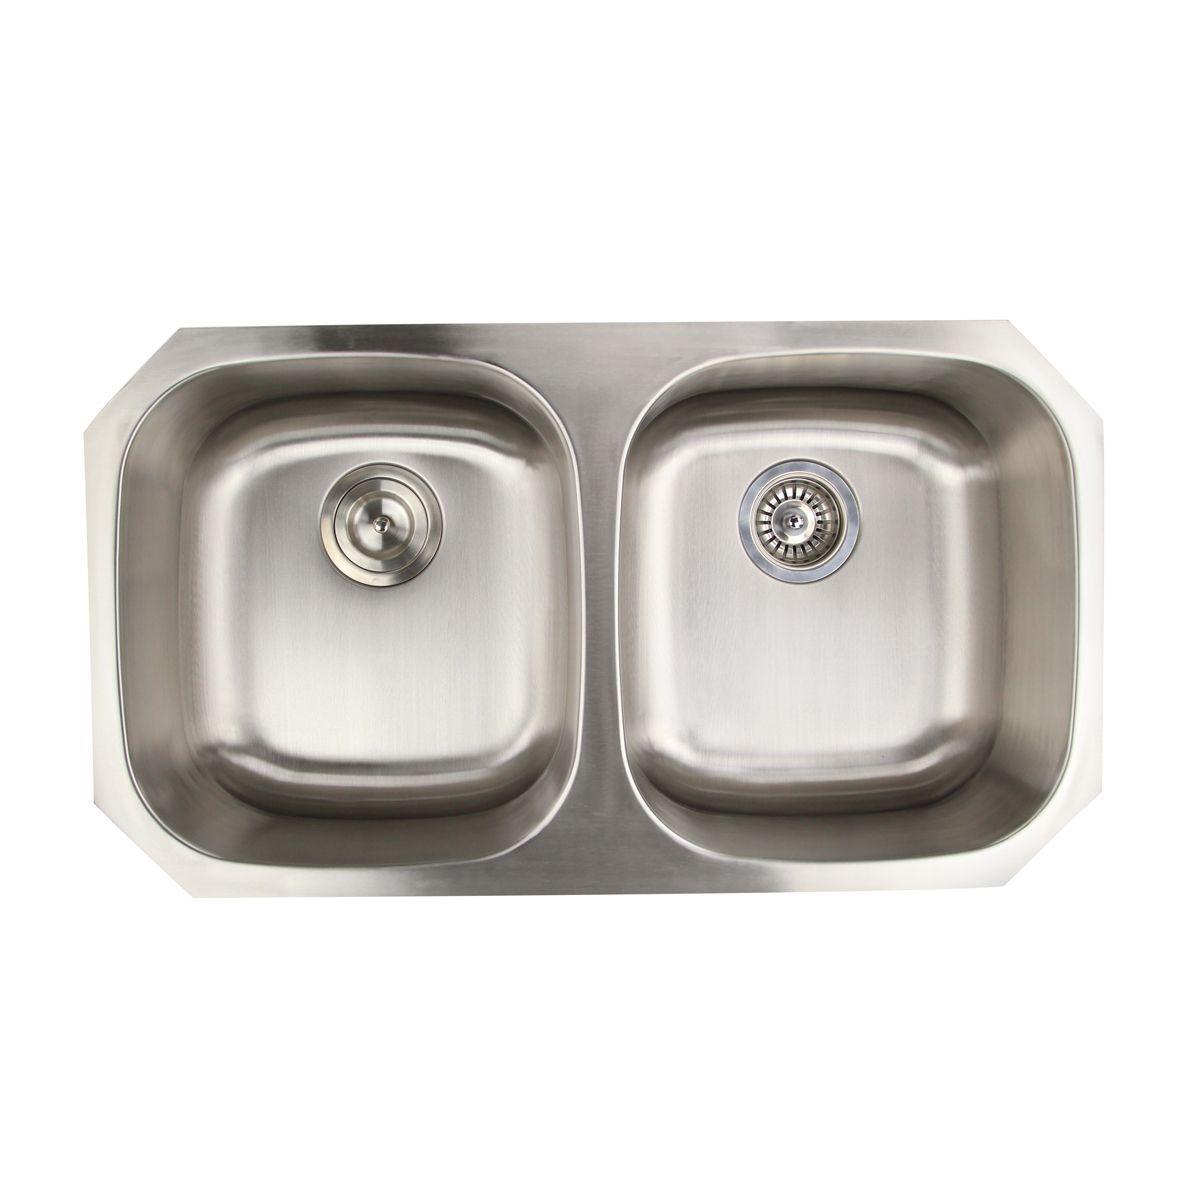 16 Gauge Double Equal Bowl 50 50 Ratio Undermount Kitchen Sink